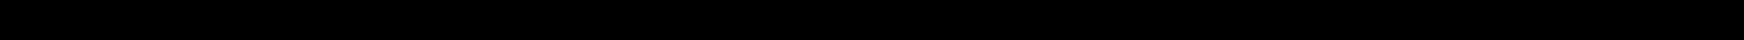 CFAstyPro-MediumOblique.otf